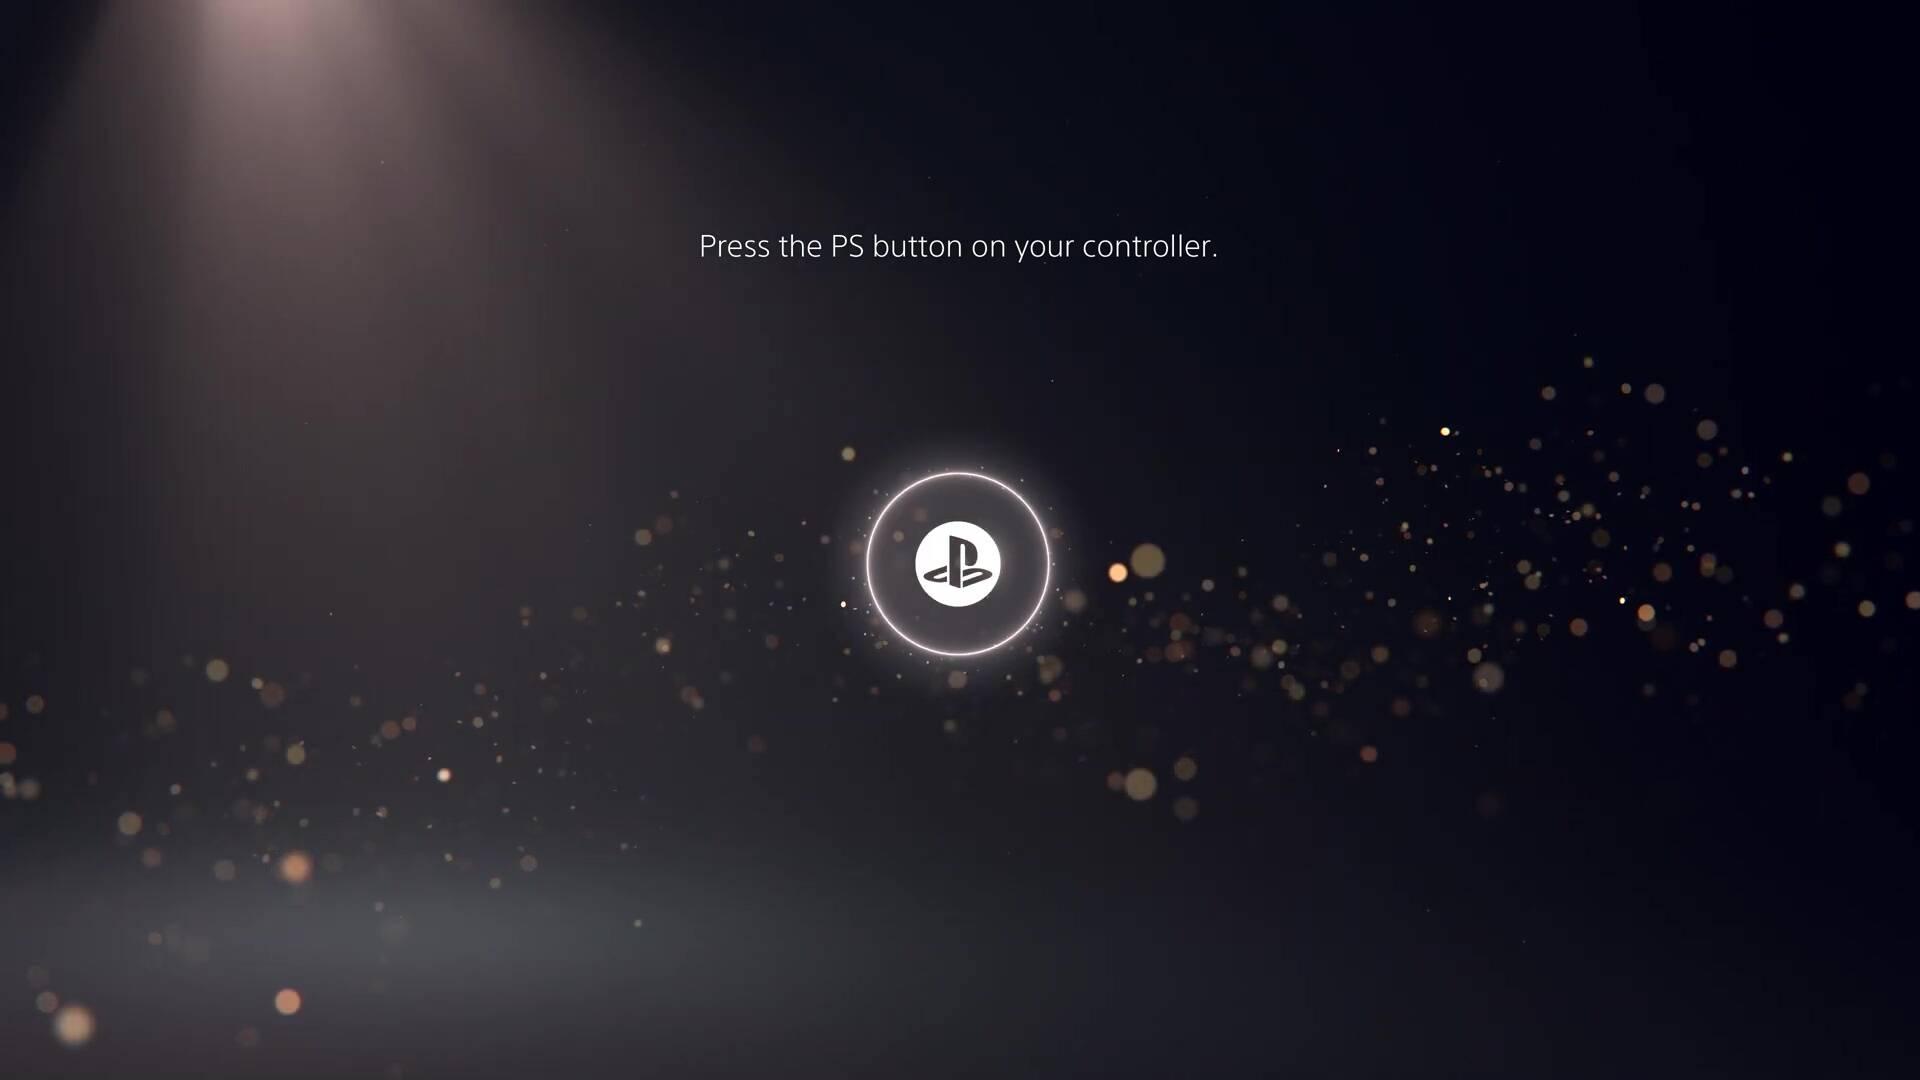 PS5 PlayStation 5 Interfaccia Utente